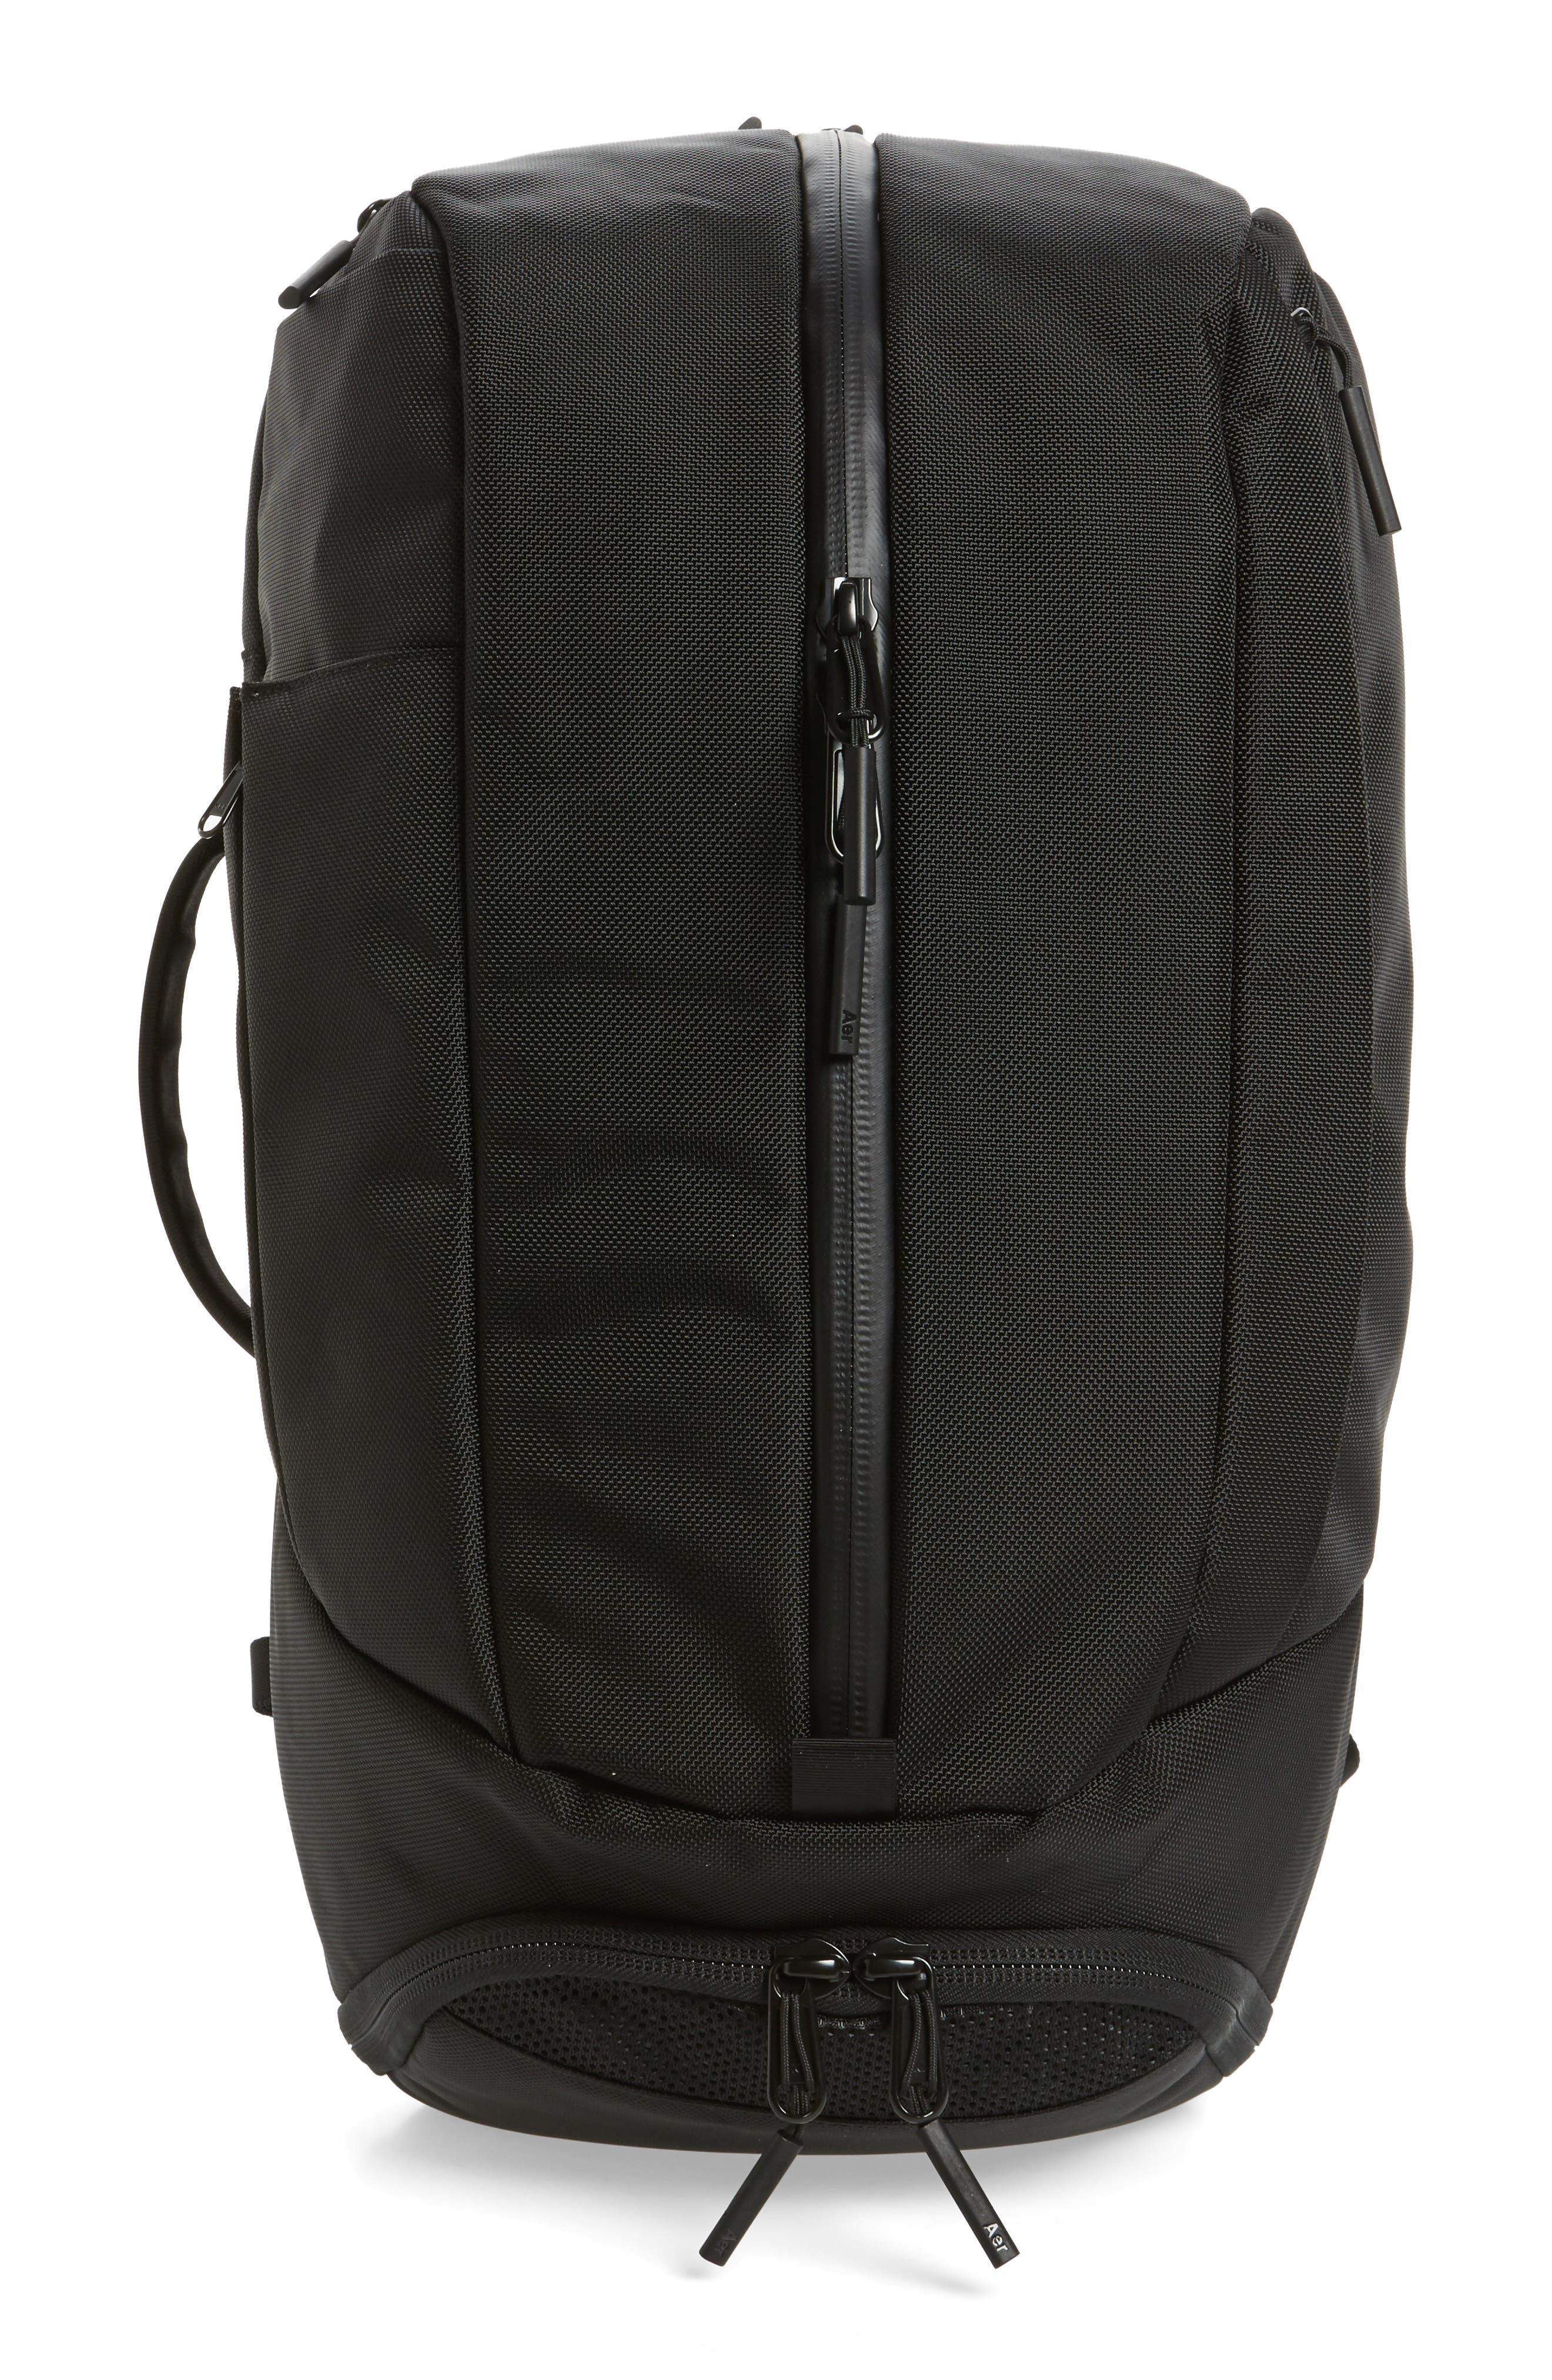 Duffel Pack 2 Convertible Backpack,                             Main thumbnail 1, color,                             BLACK